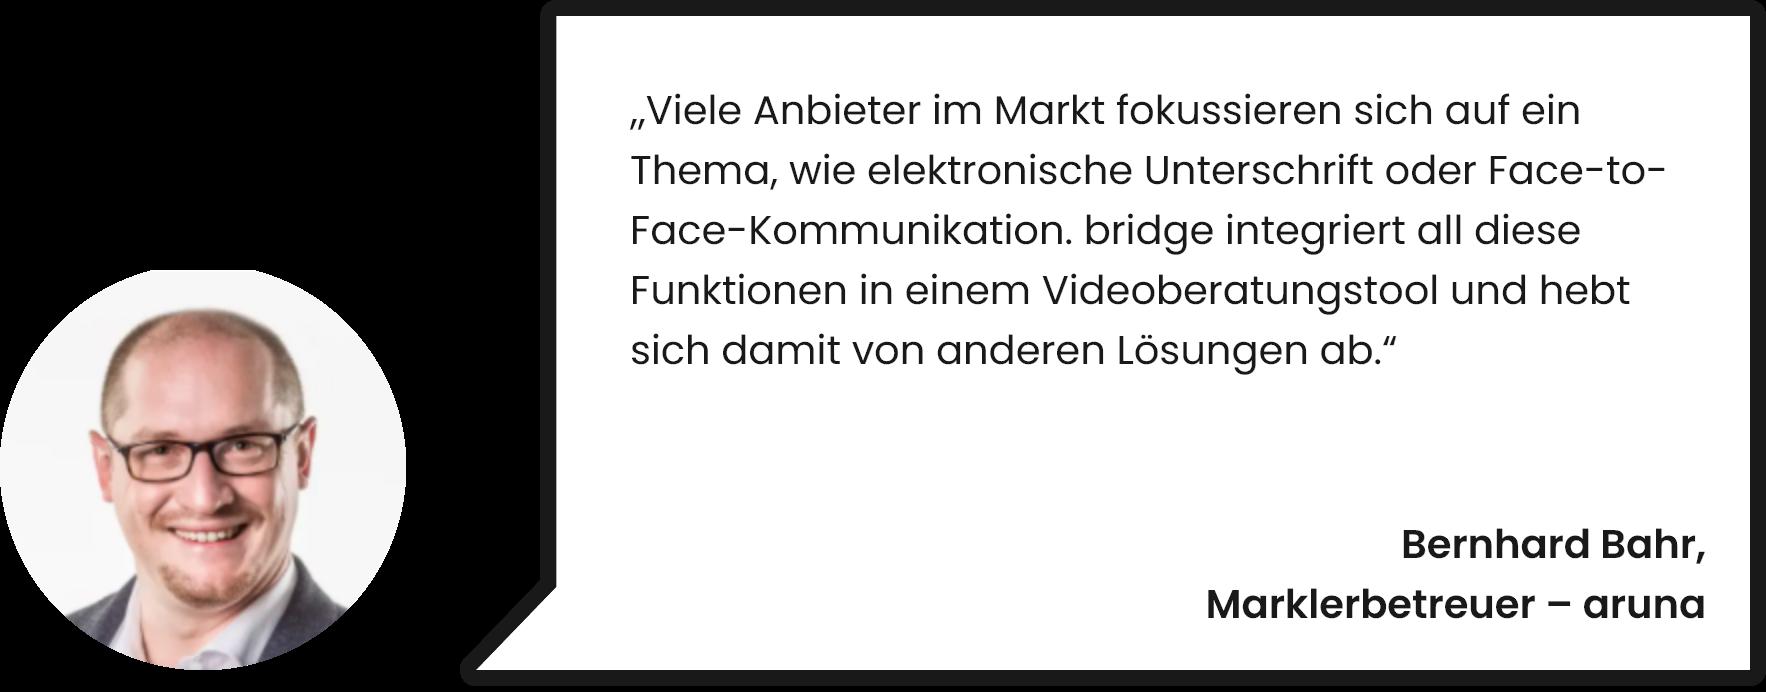 bild-zitat-1-bridge-kunde-maklerpool-aruna-allumfassende-software-online-beratung